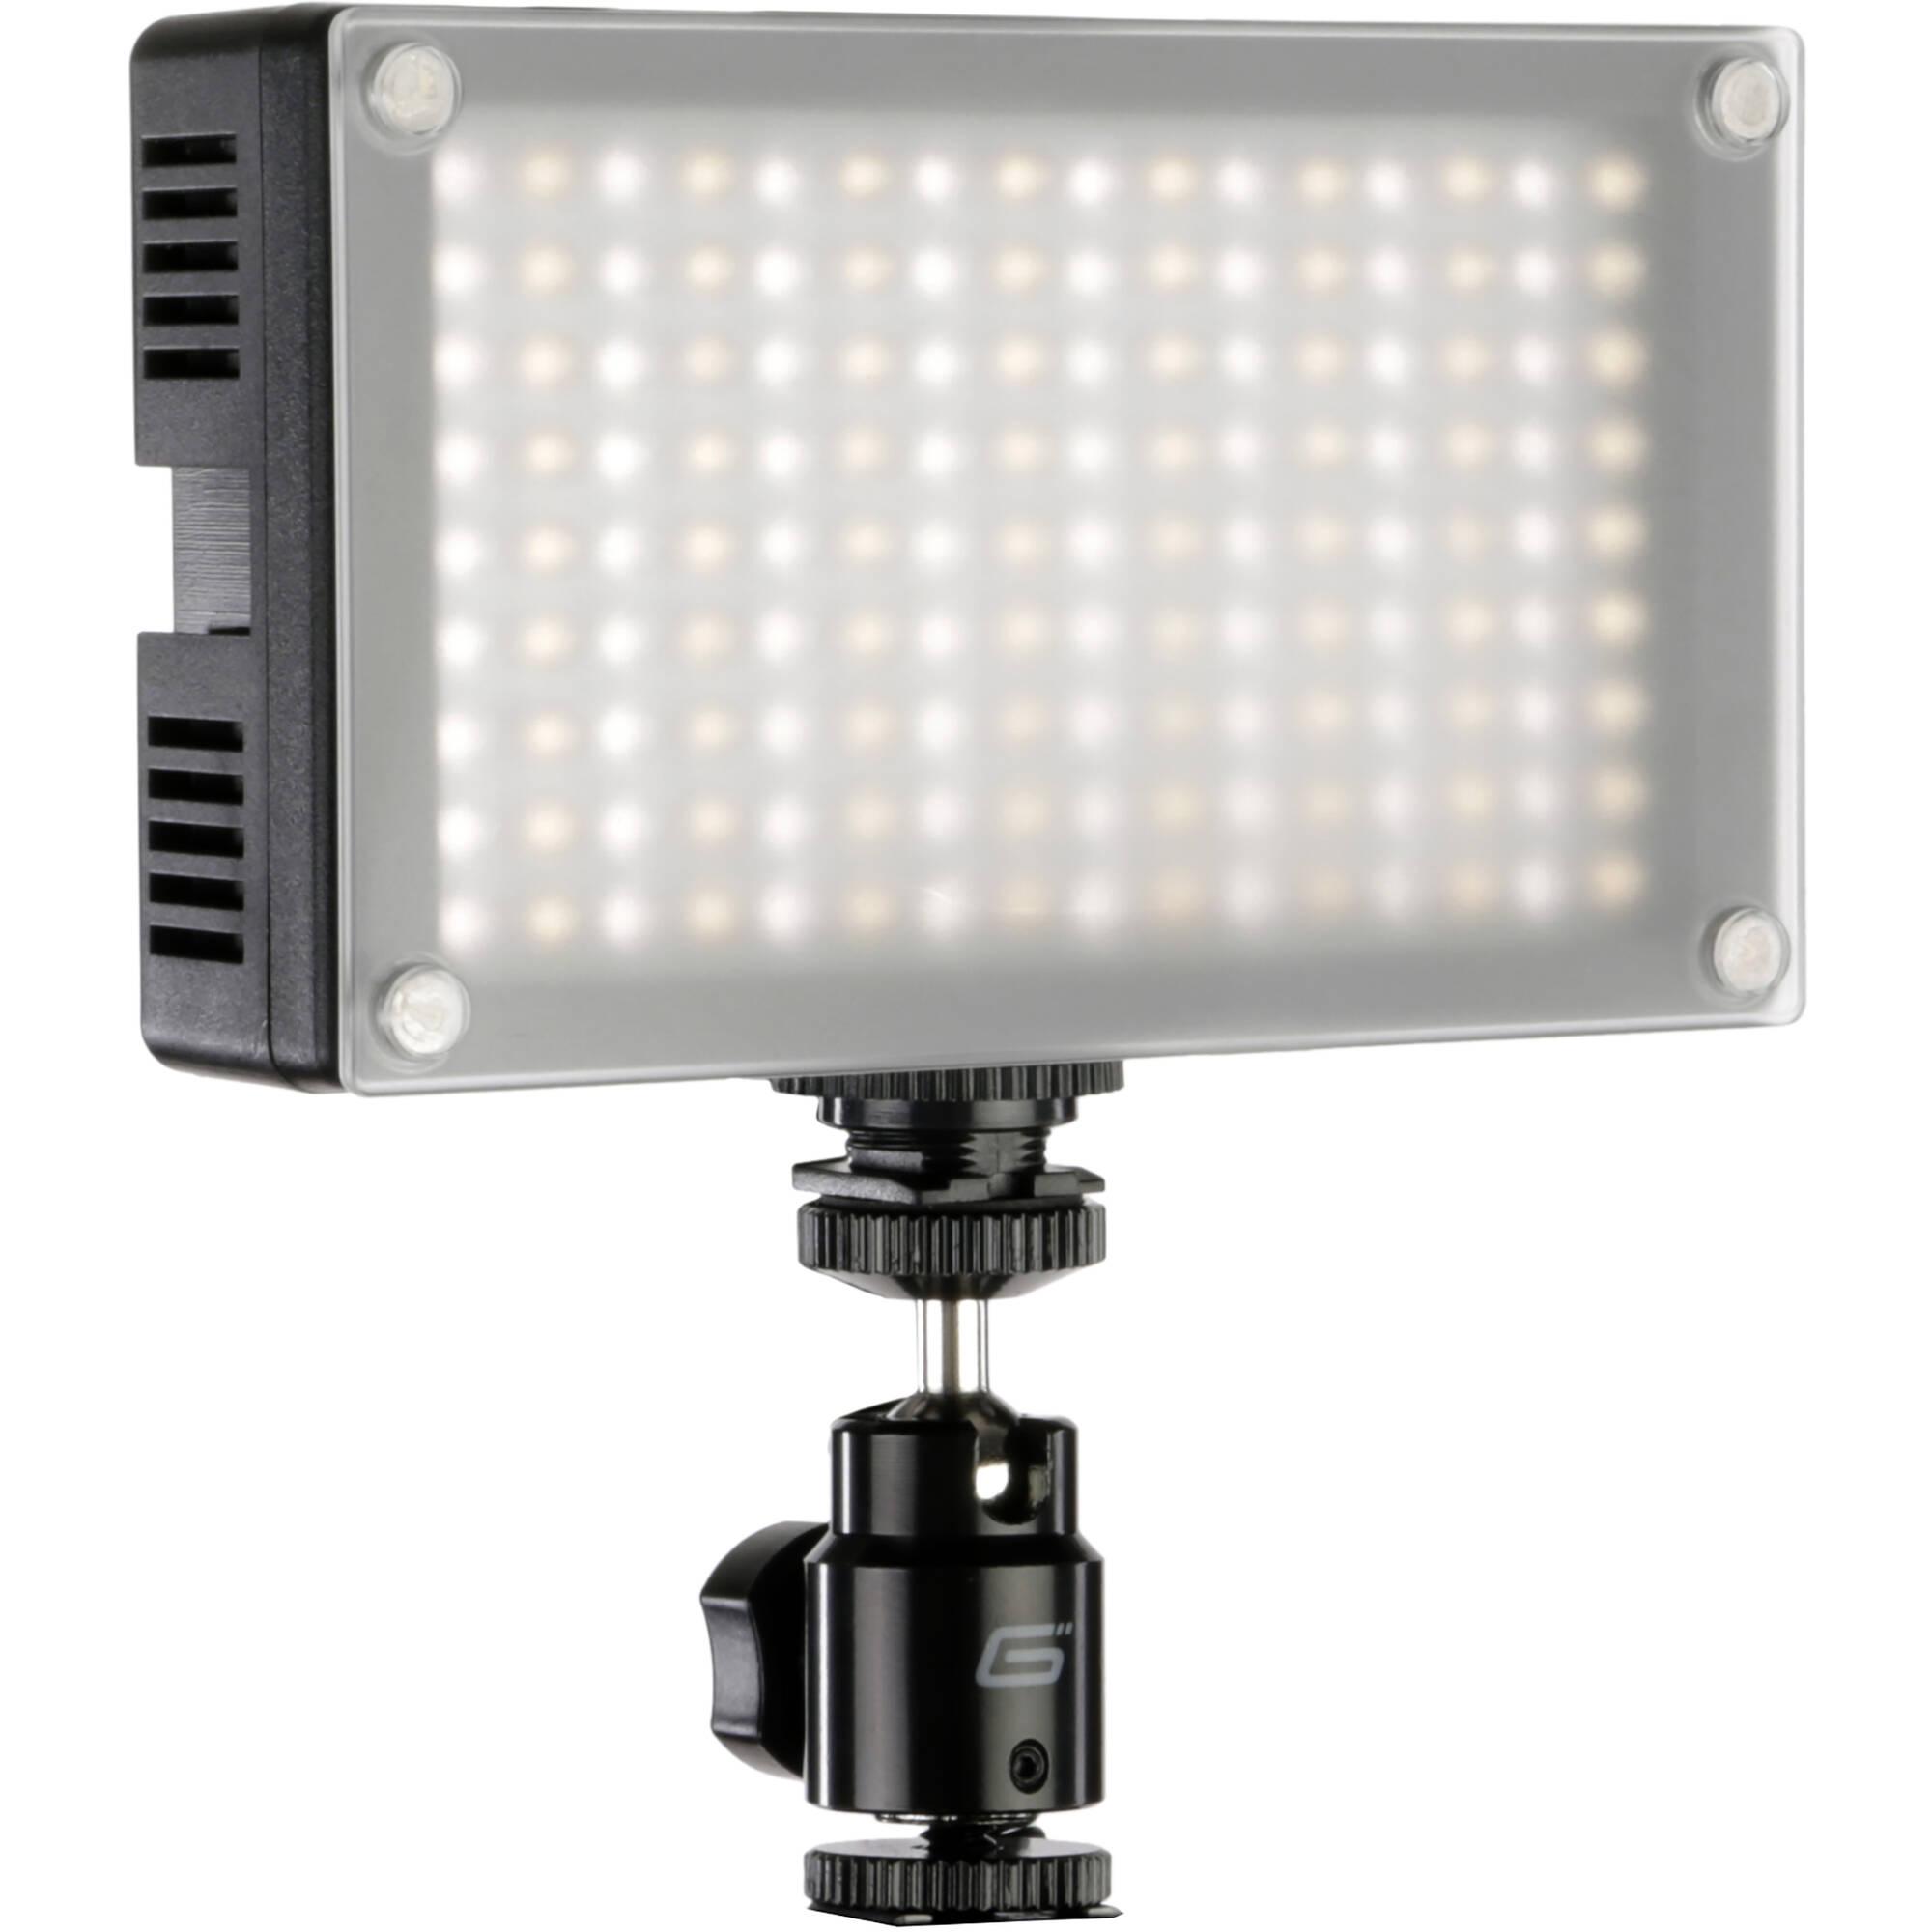 Variable Camera On 6200t Genaray 144 Color Led Light exdCoB